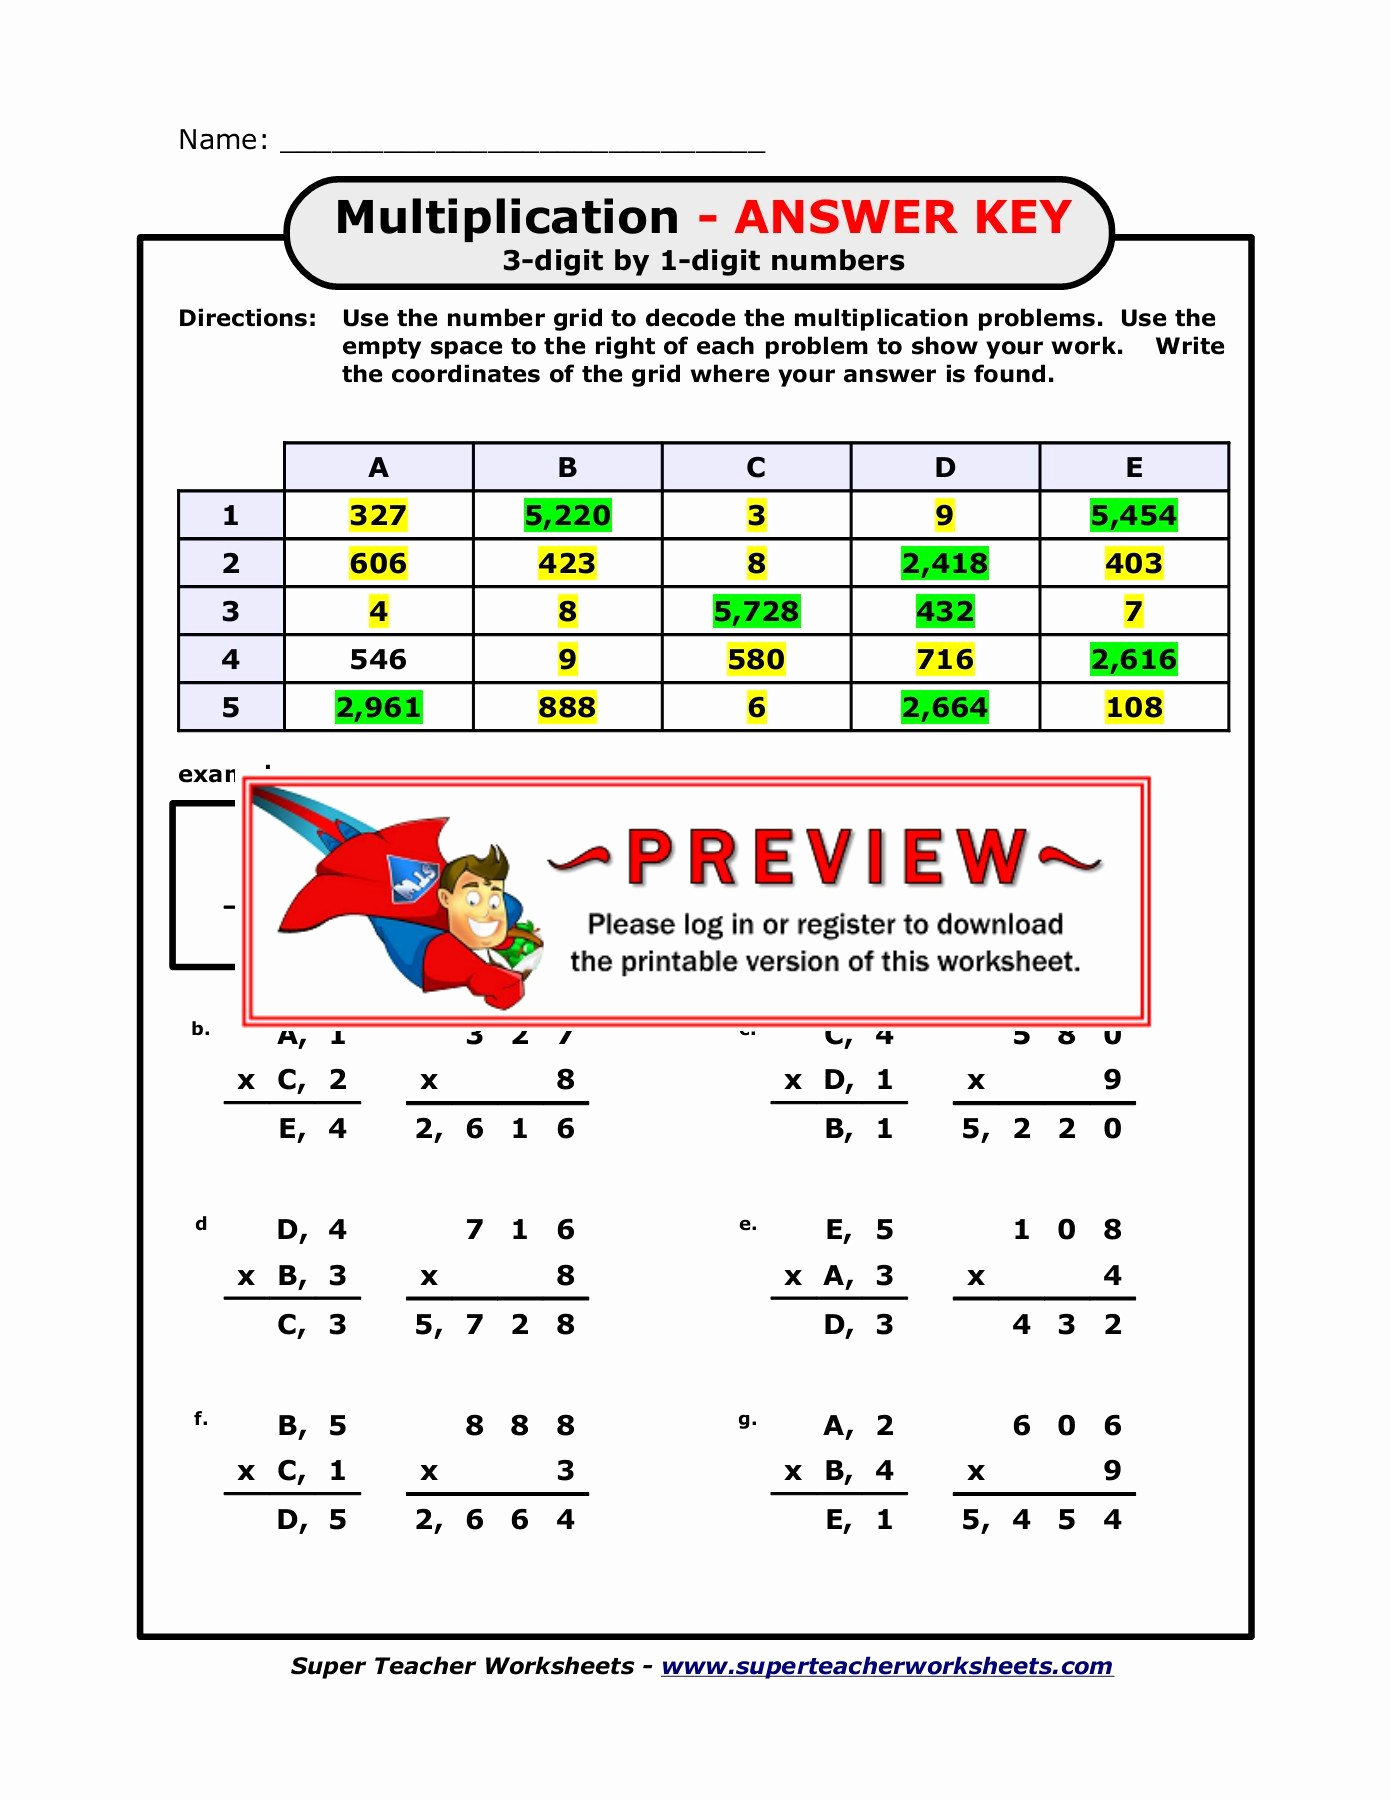 Super Teachers Worksheets Login Fresh 20 Super Teachers Worksheets Login